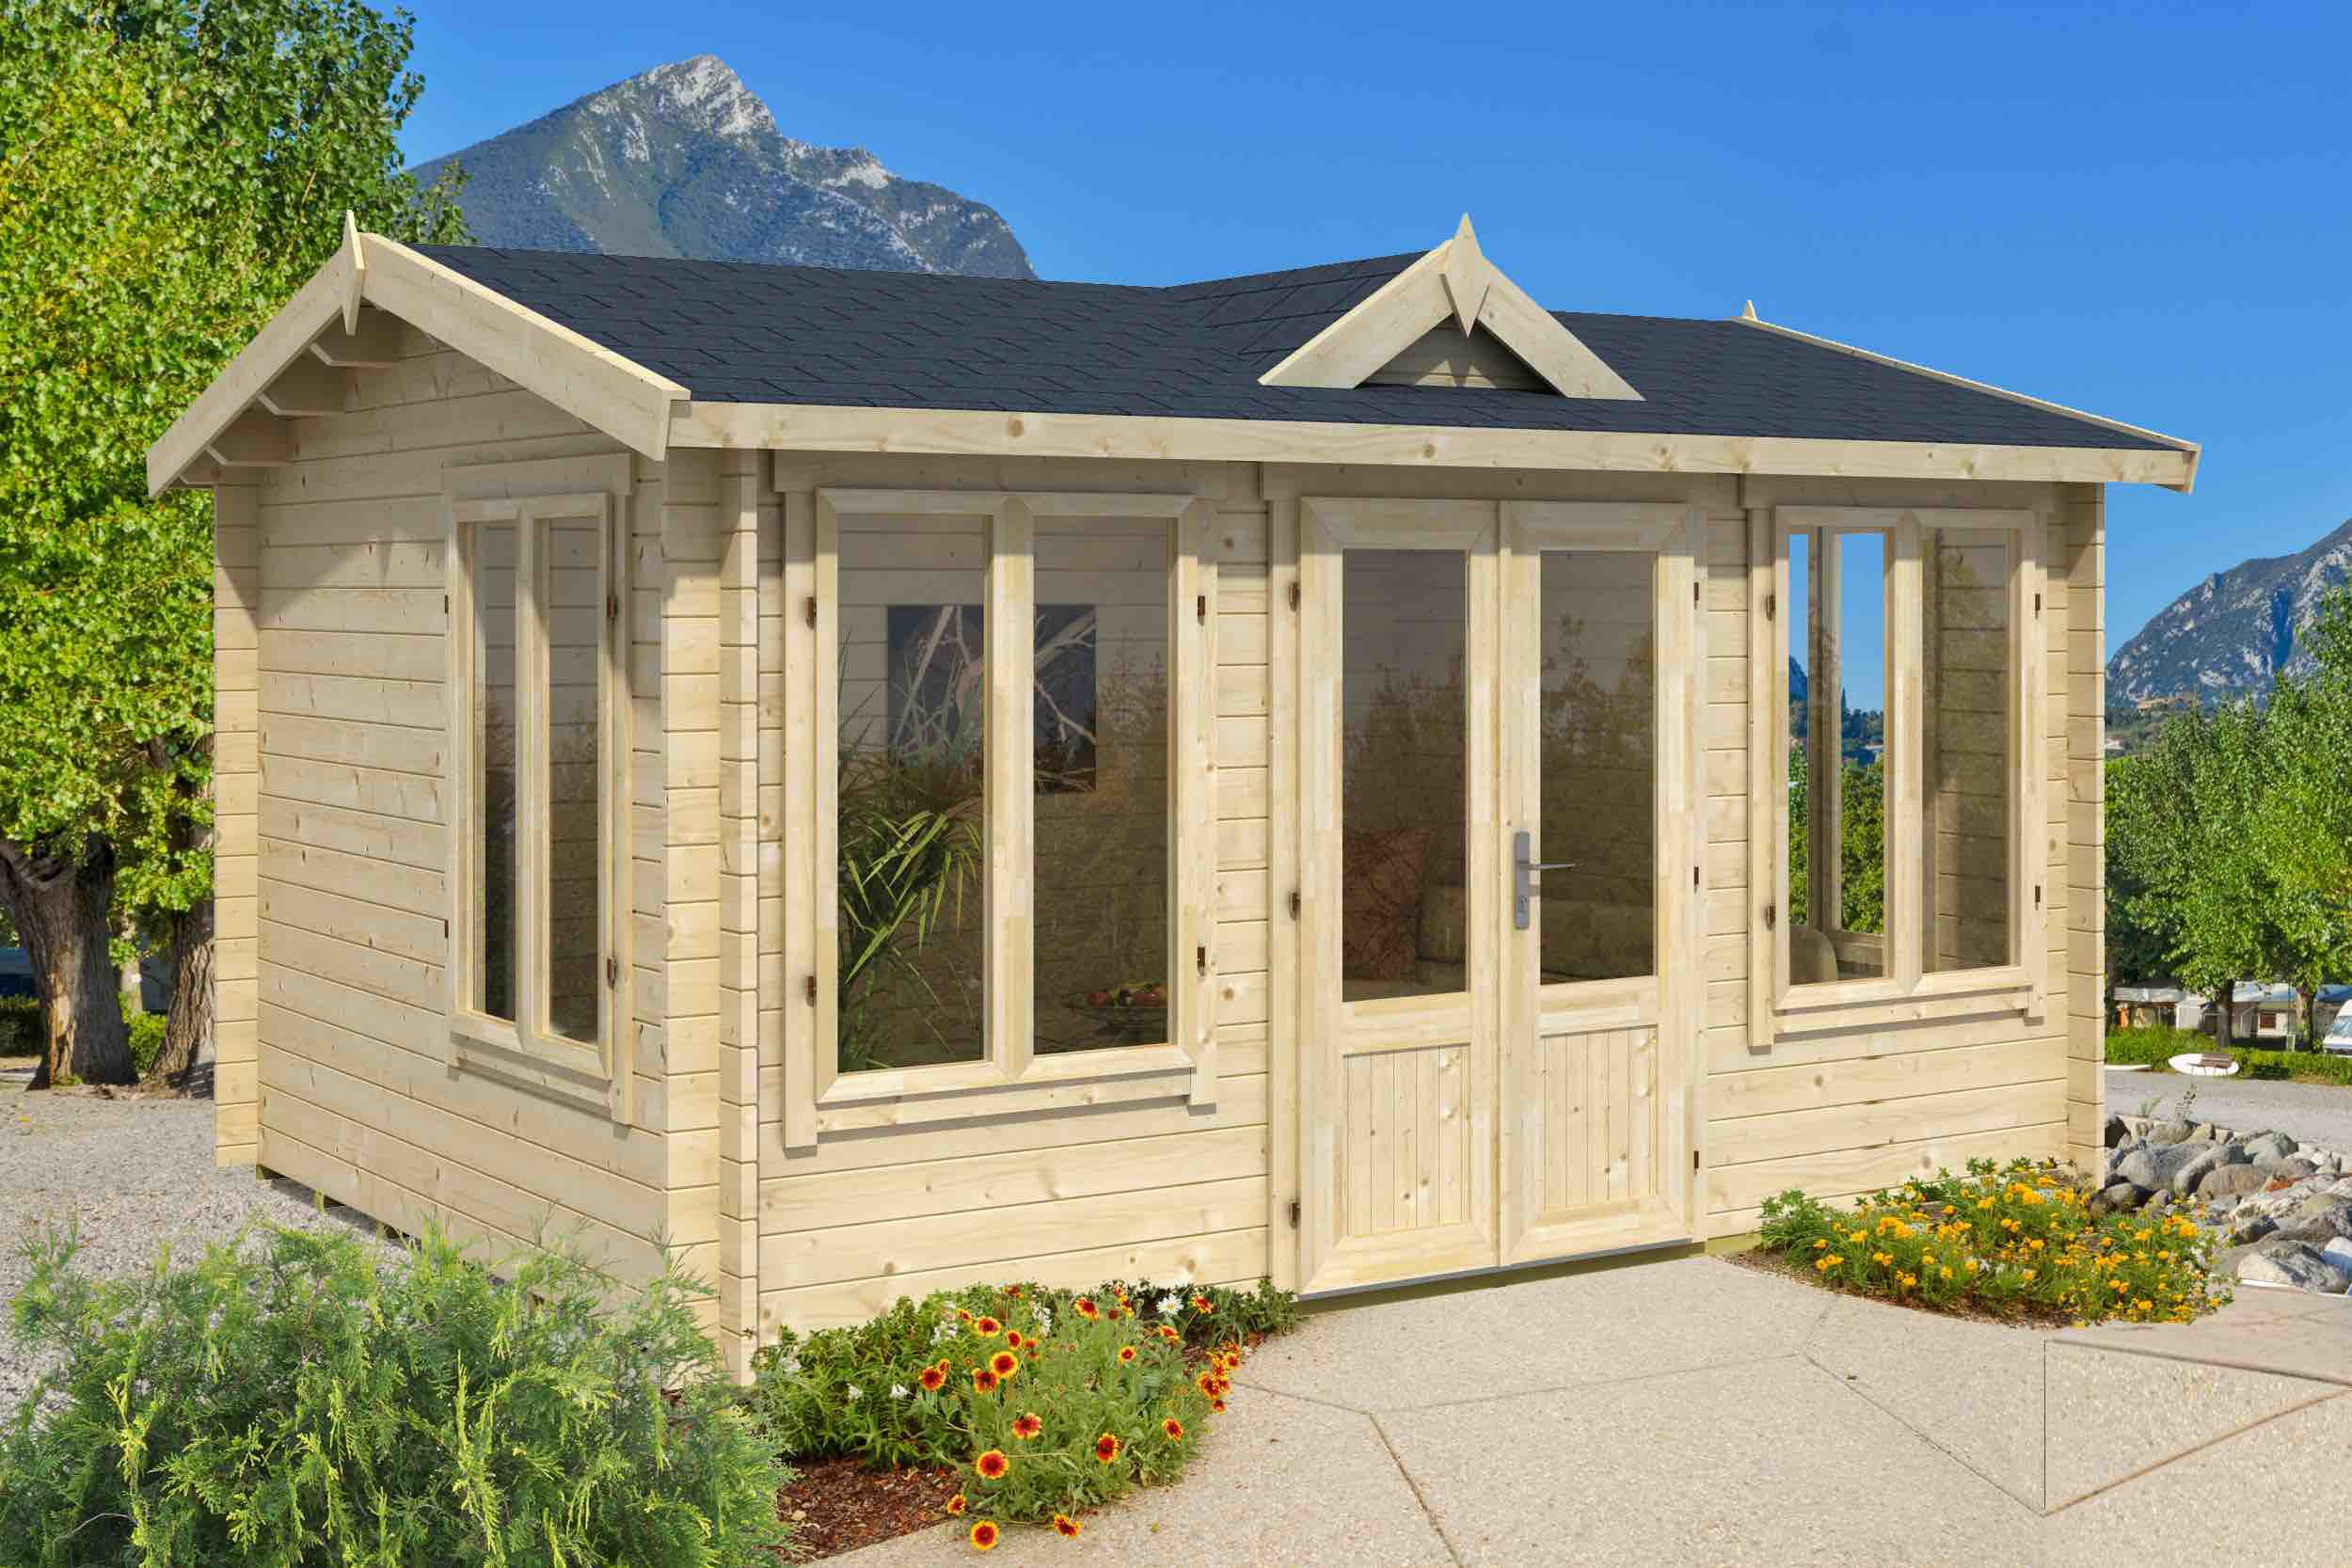 Gartenhaus G221 inkl. Fußboden - 44 mm Blockbohlenhaus, Grundfläche: 11,40 m², Satteldach